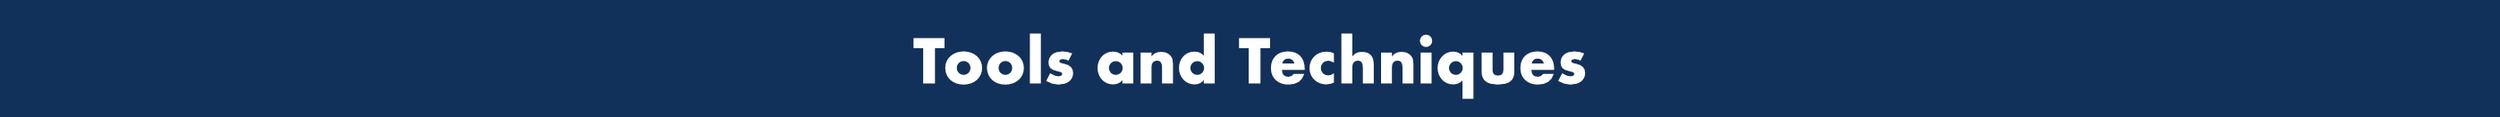 ToolsHeader.png